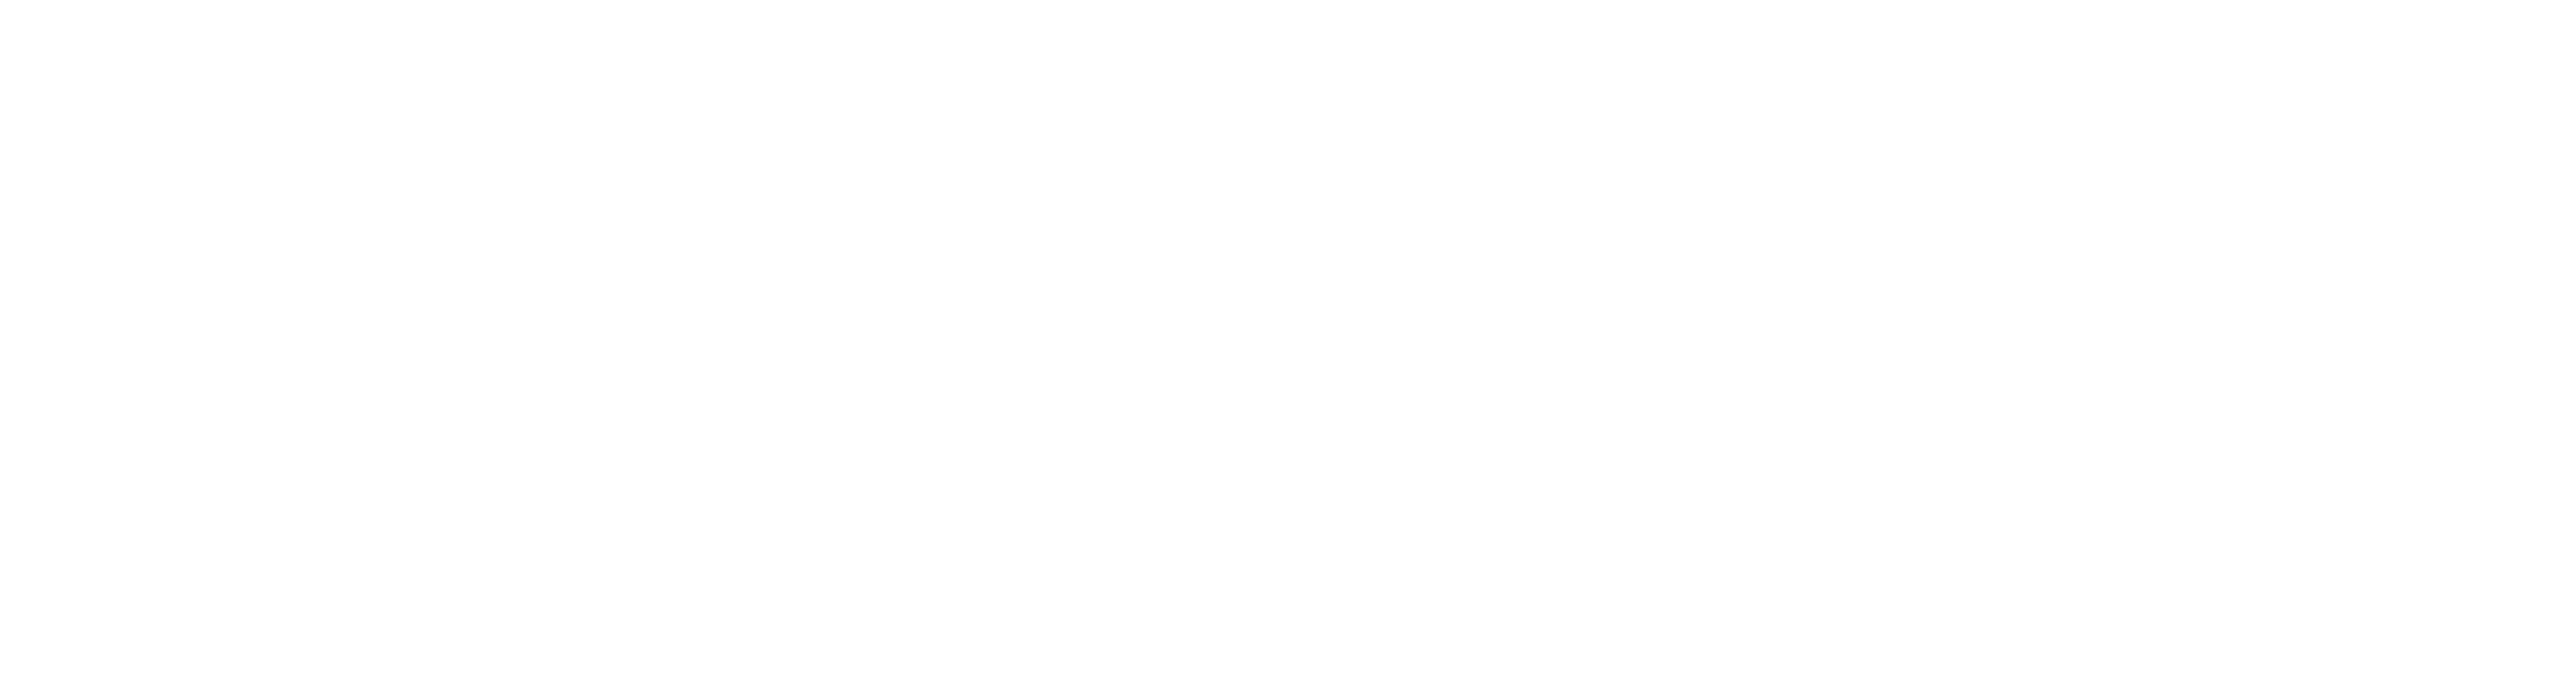 Coompanion Norrbotten